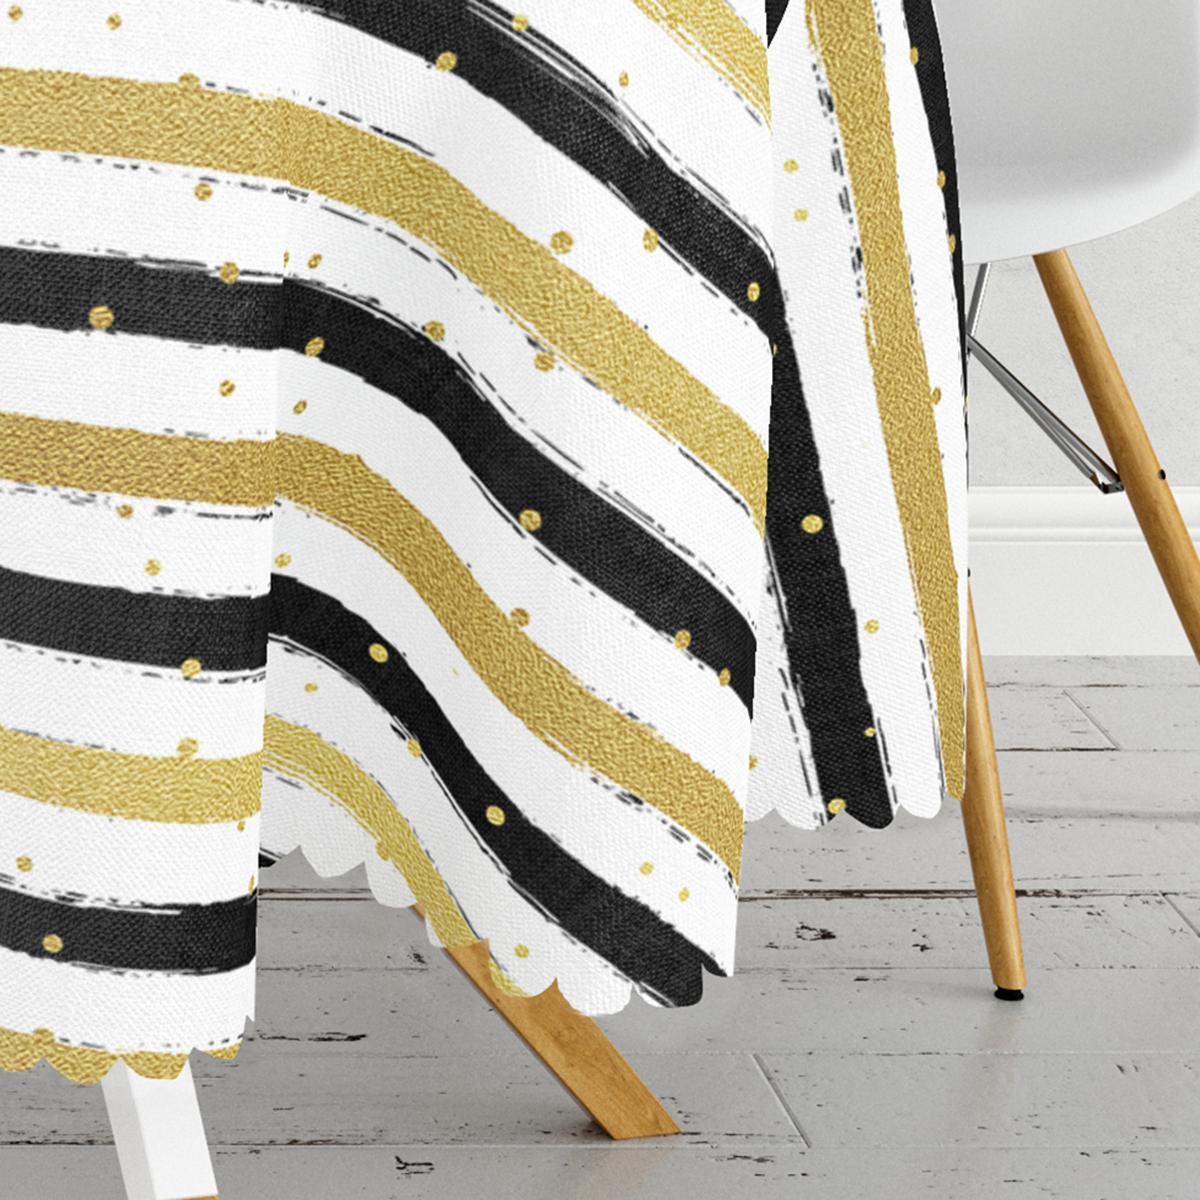 Beyaz Zemin Üzerinde Gold Detaylı Siyah Yatay Çizgili Yuvarlak Masa Örtüsü - Çap 140cm Realhomes